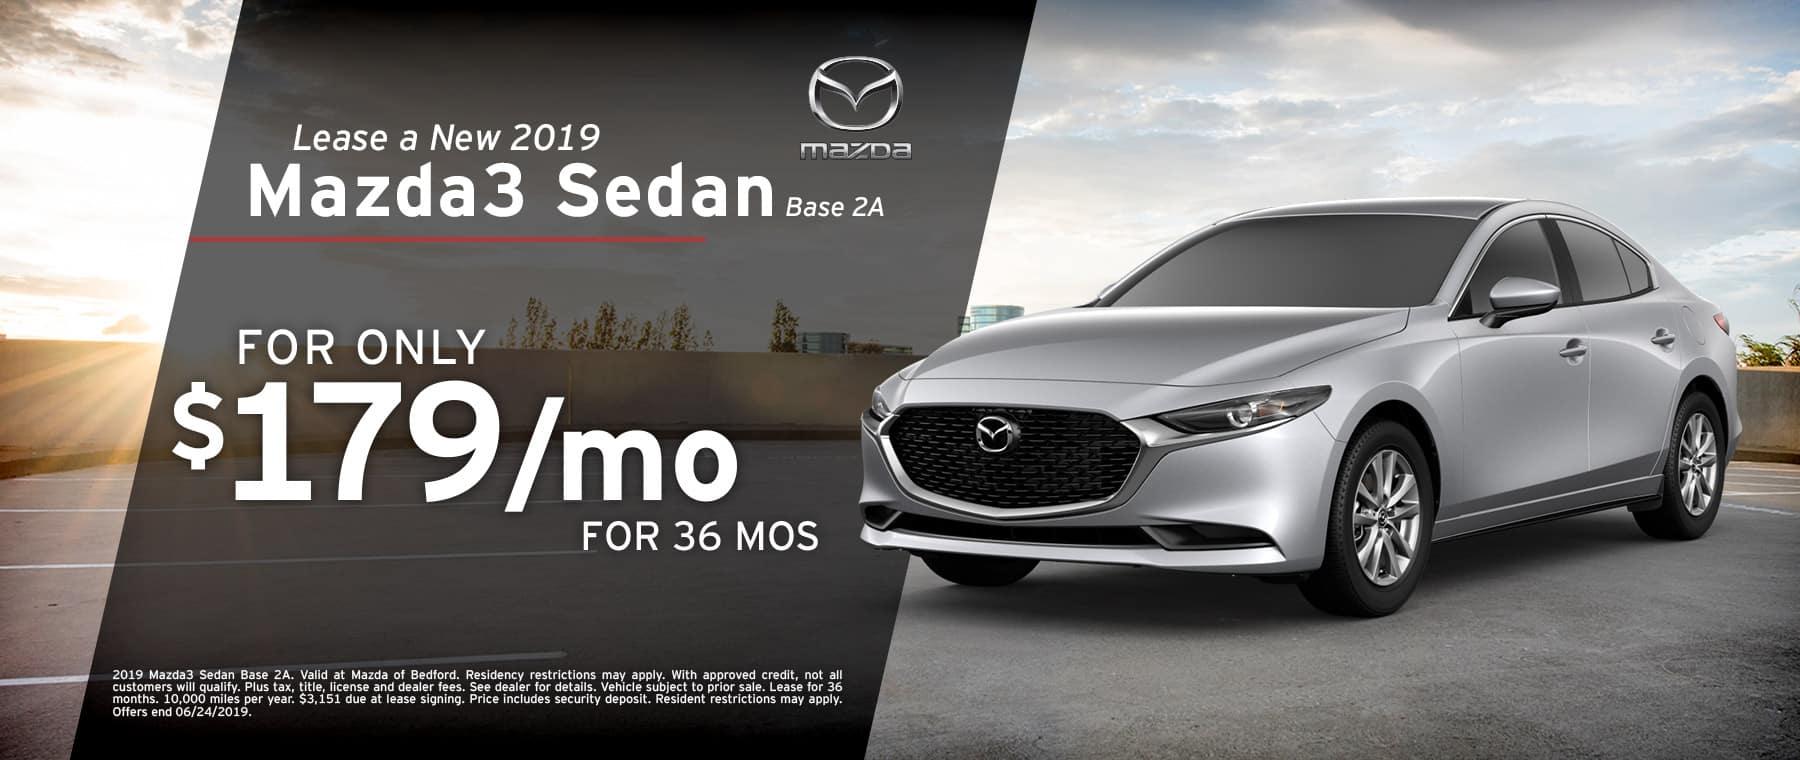 2019 Mazda3 Lease Offer